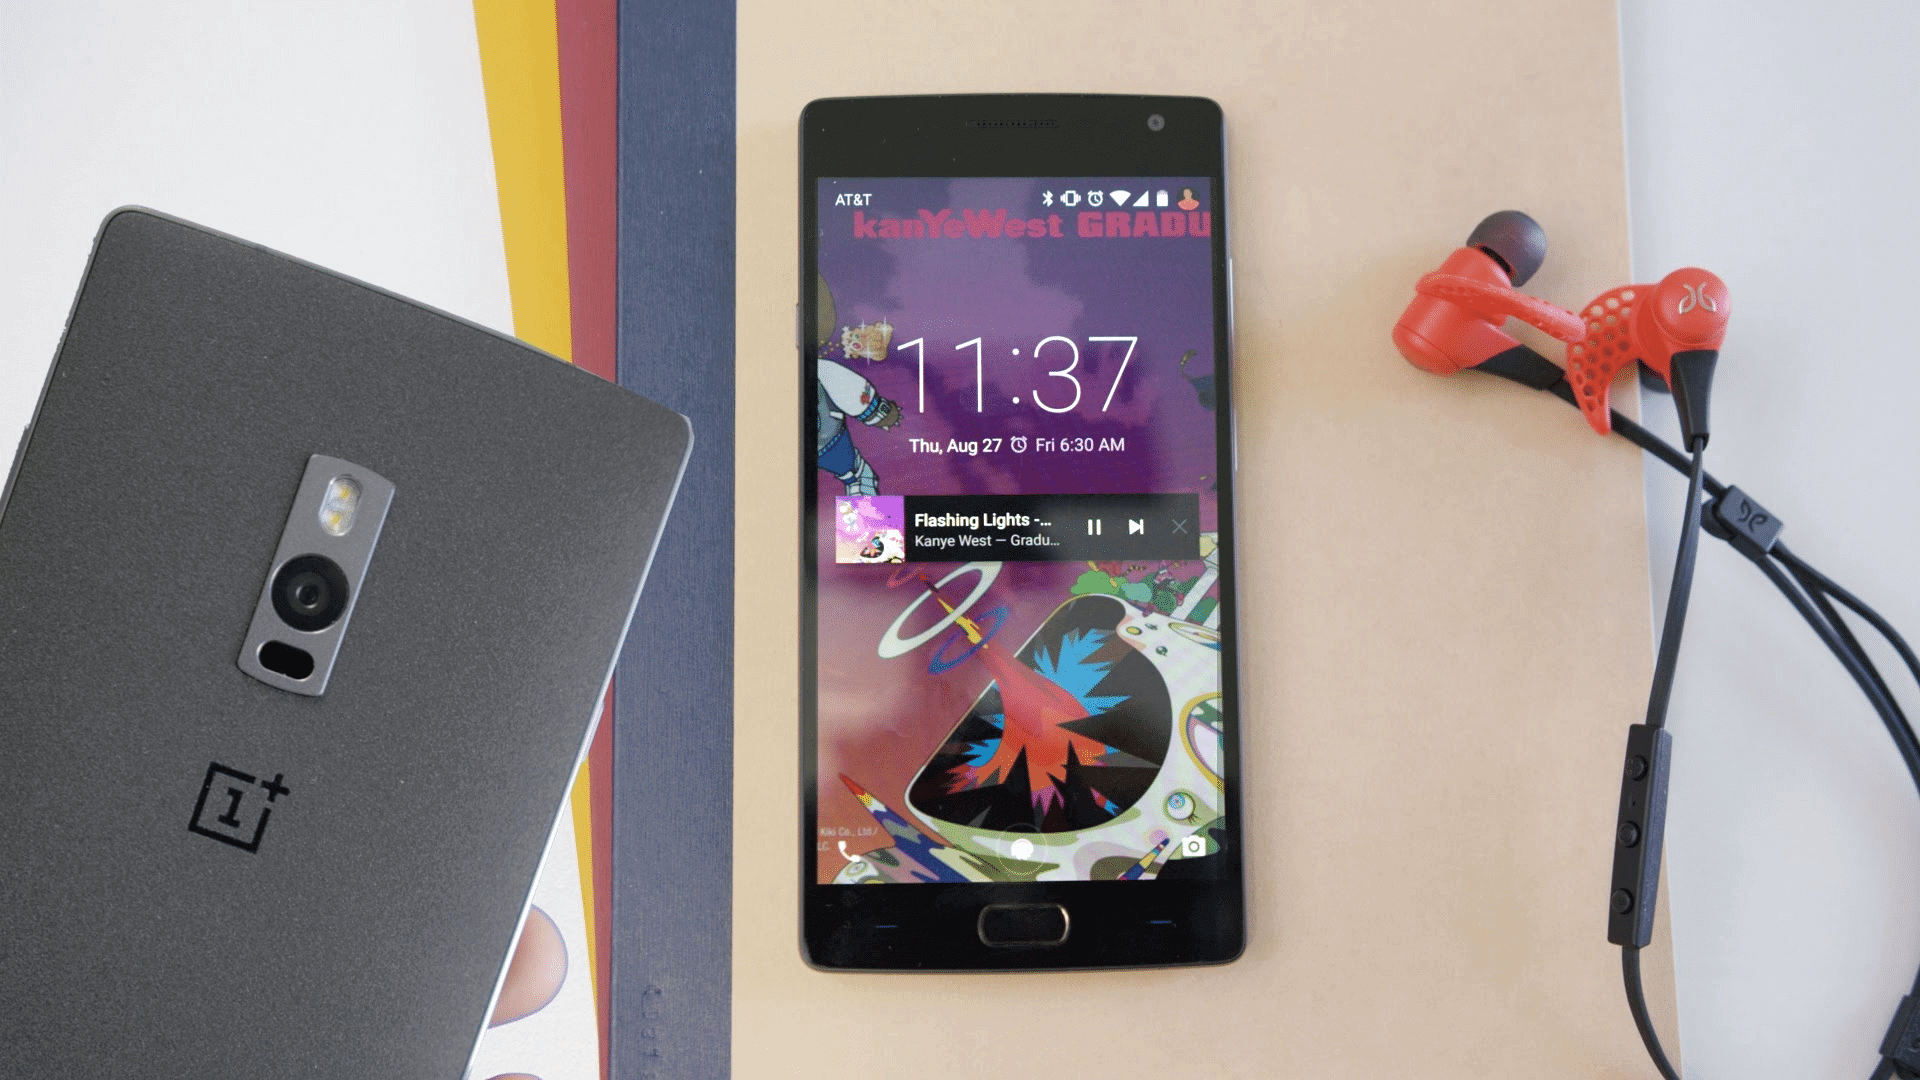 Install Android 7.1.1 Nougat via Cosmic custom ROM On OnePlus 2 1